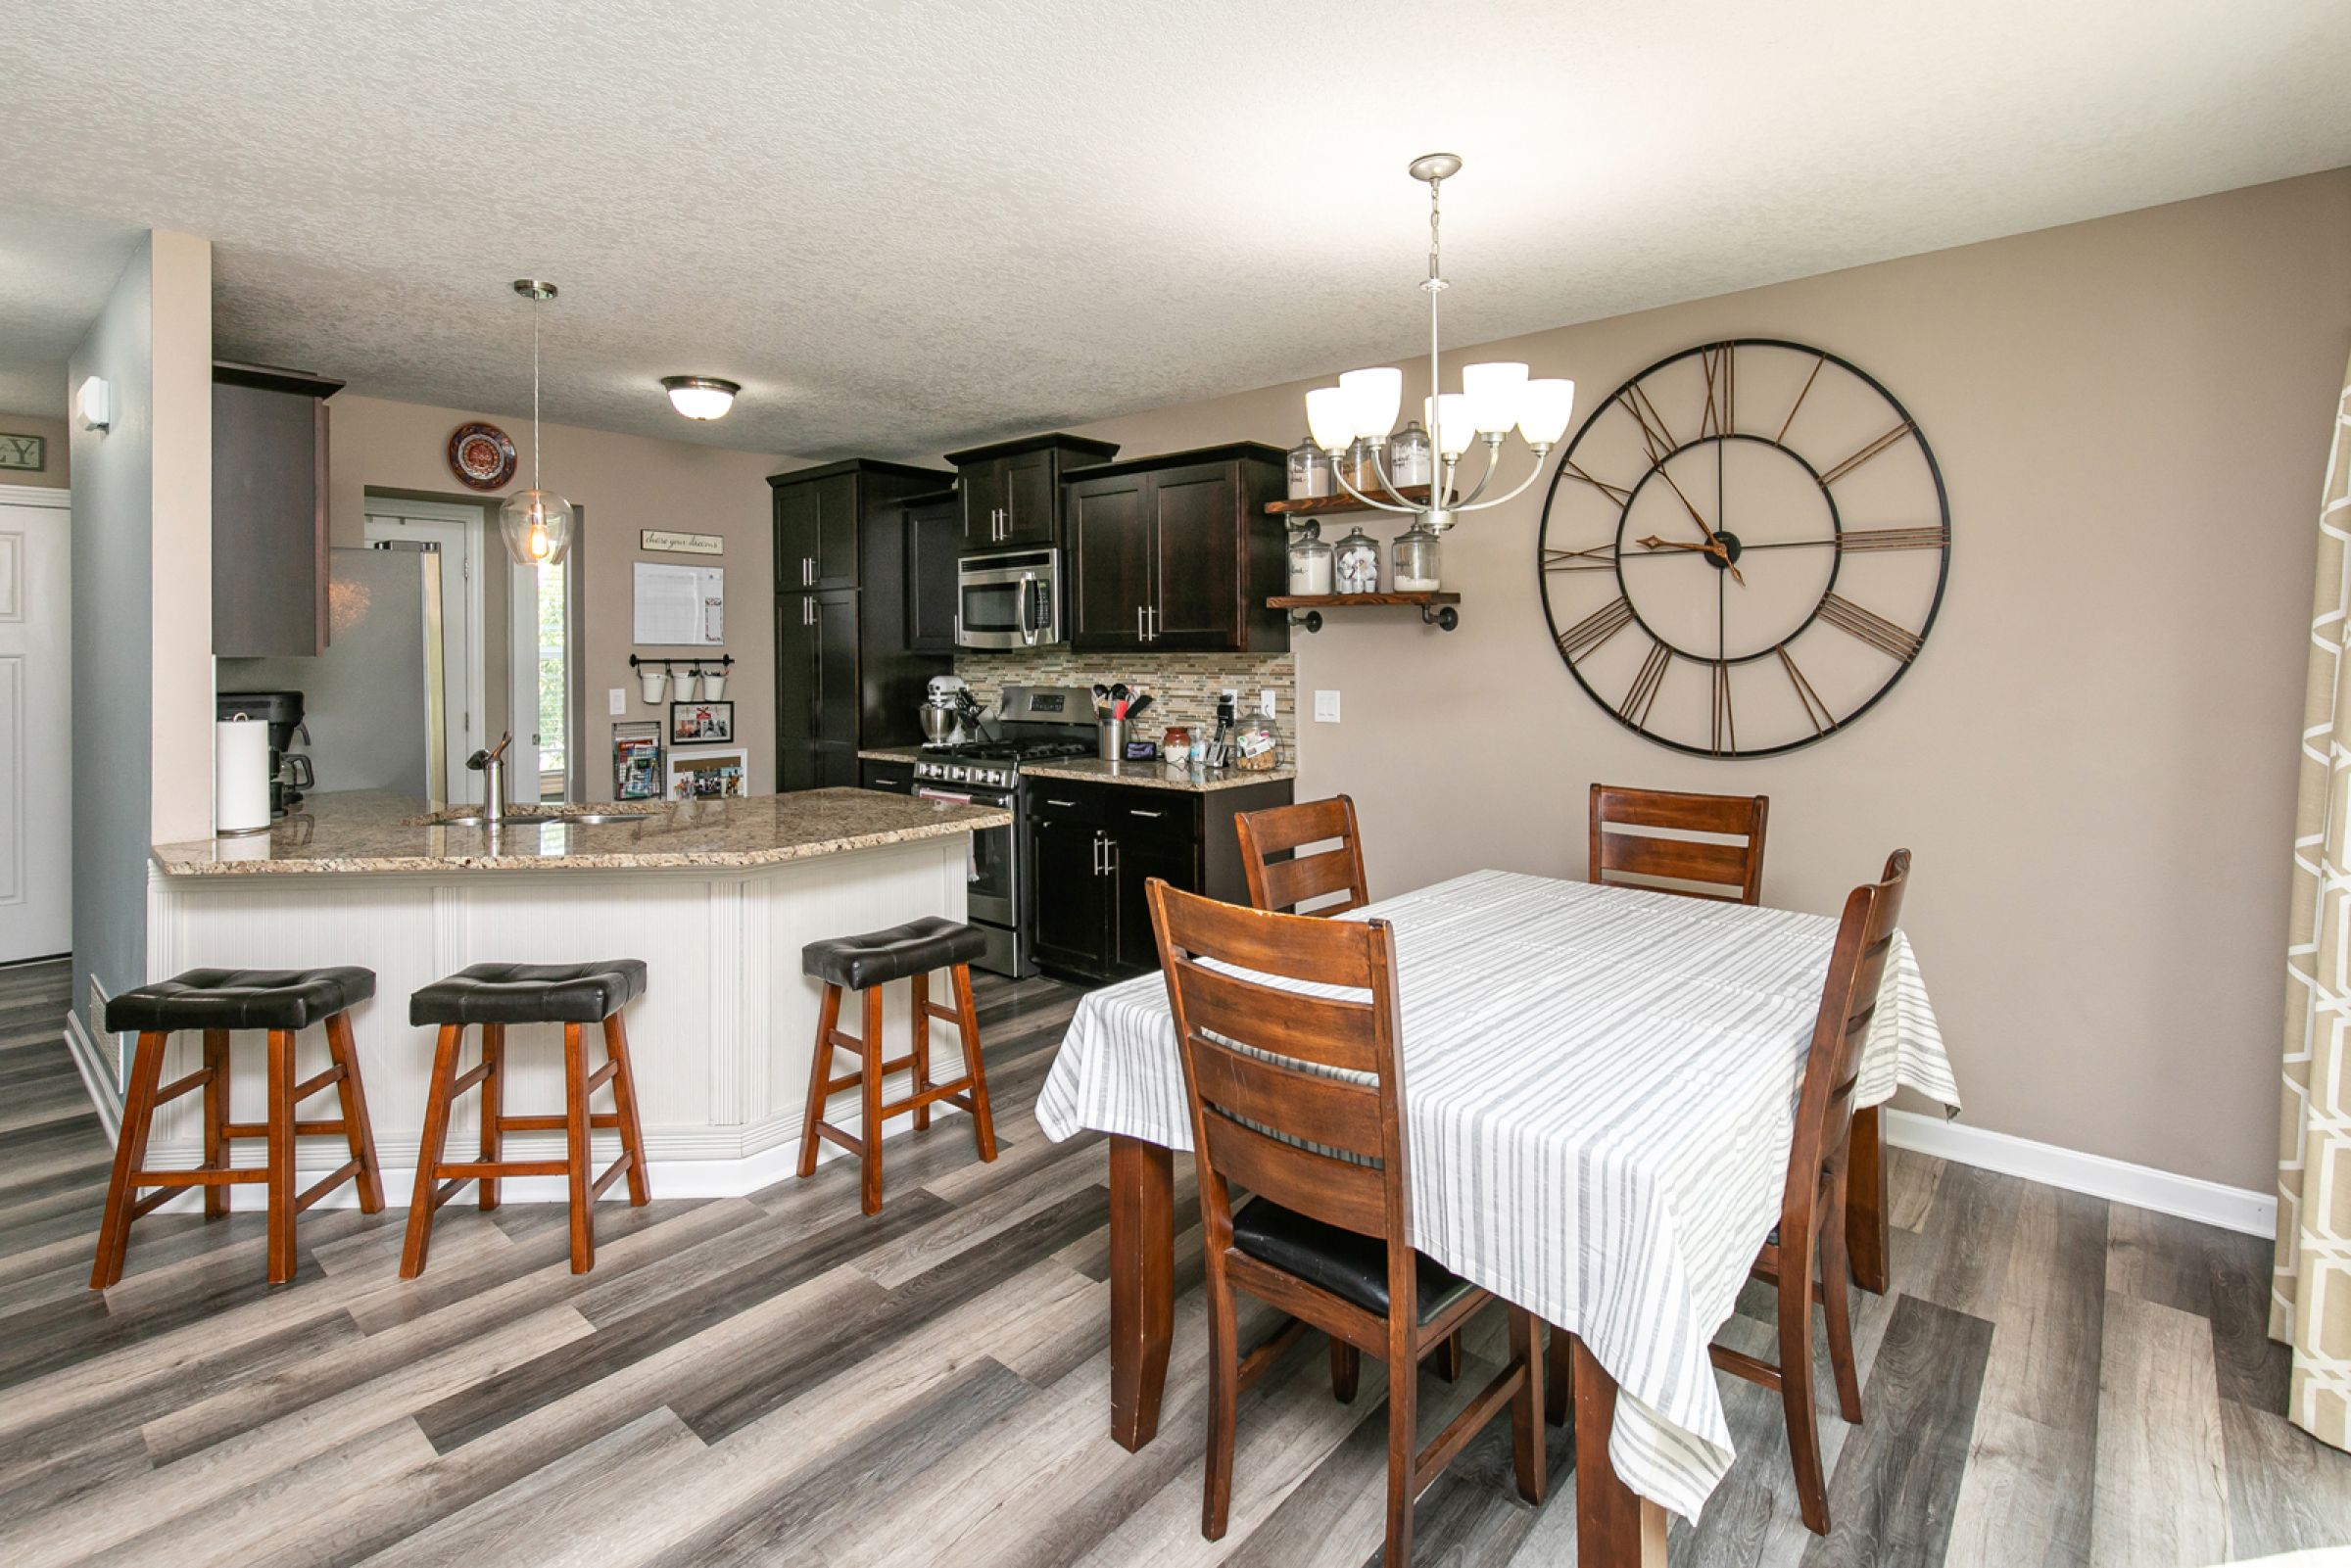 residential-warren-county-iowa-0-acres-listing-number-15685-5-2021-08-31-032157.jpg